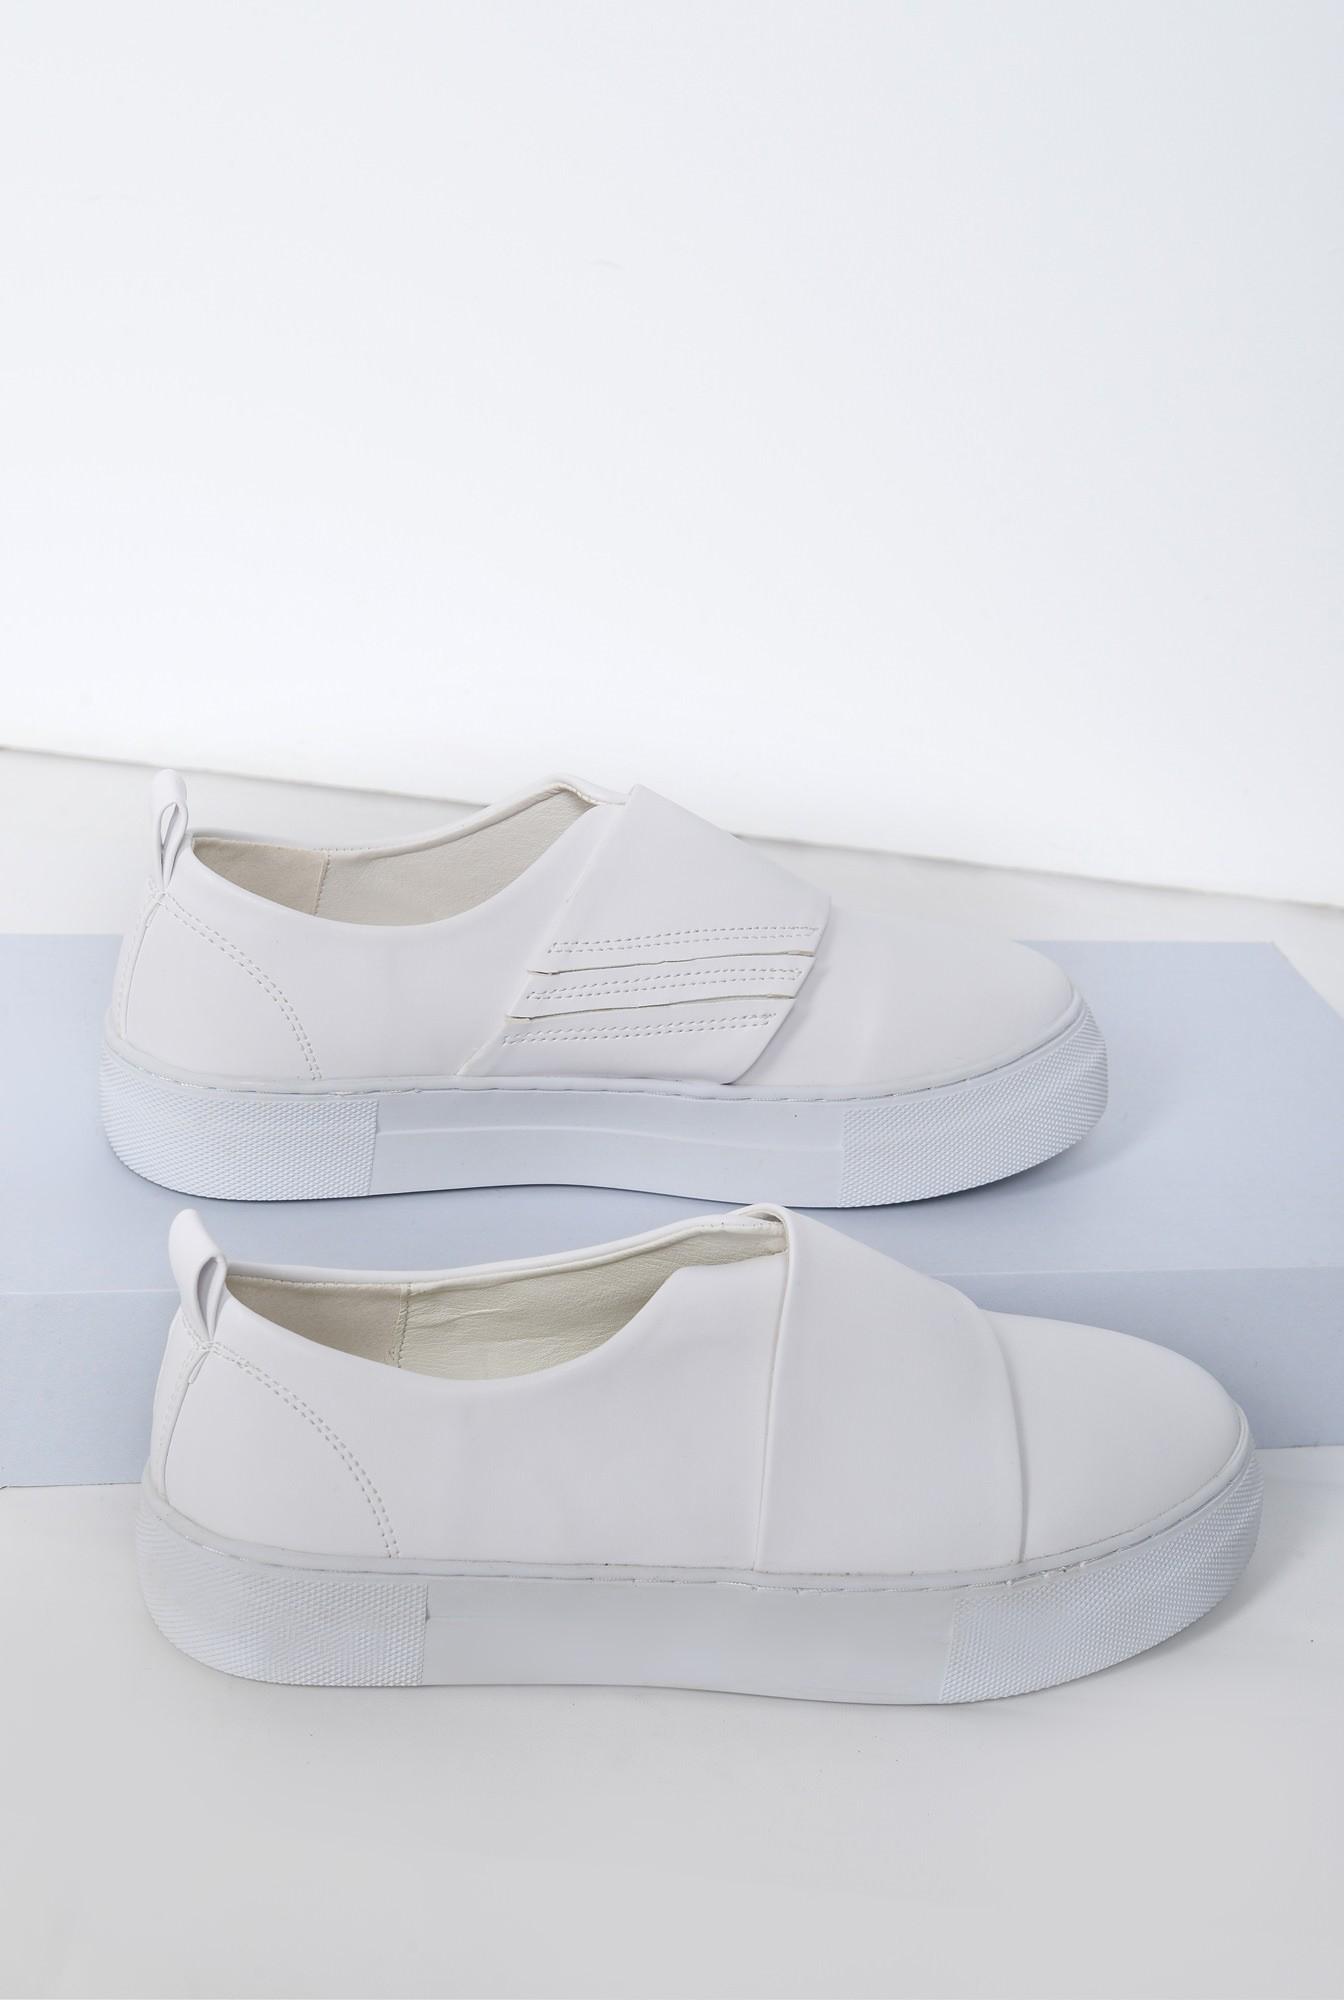 3 - Sneakers PO12091606-ALB